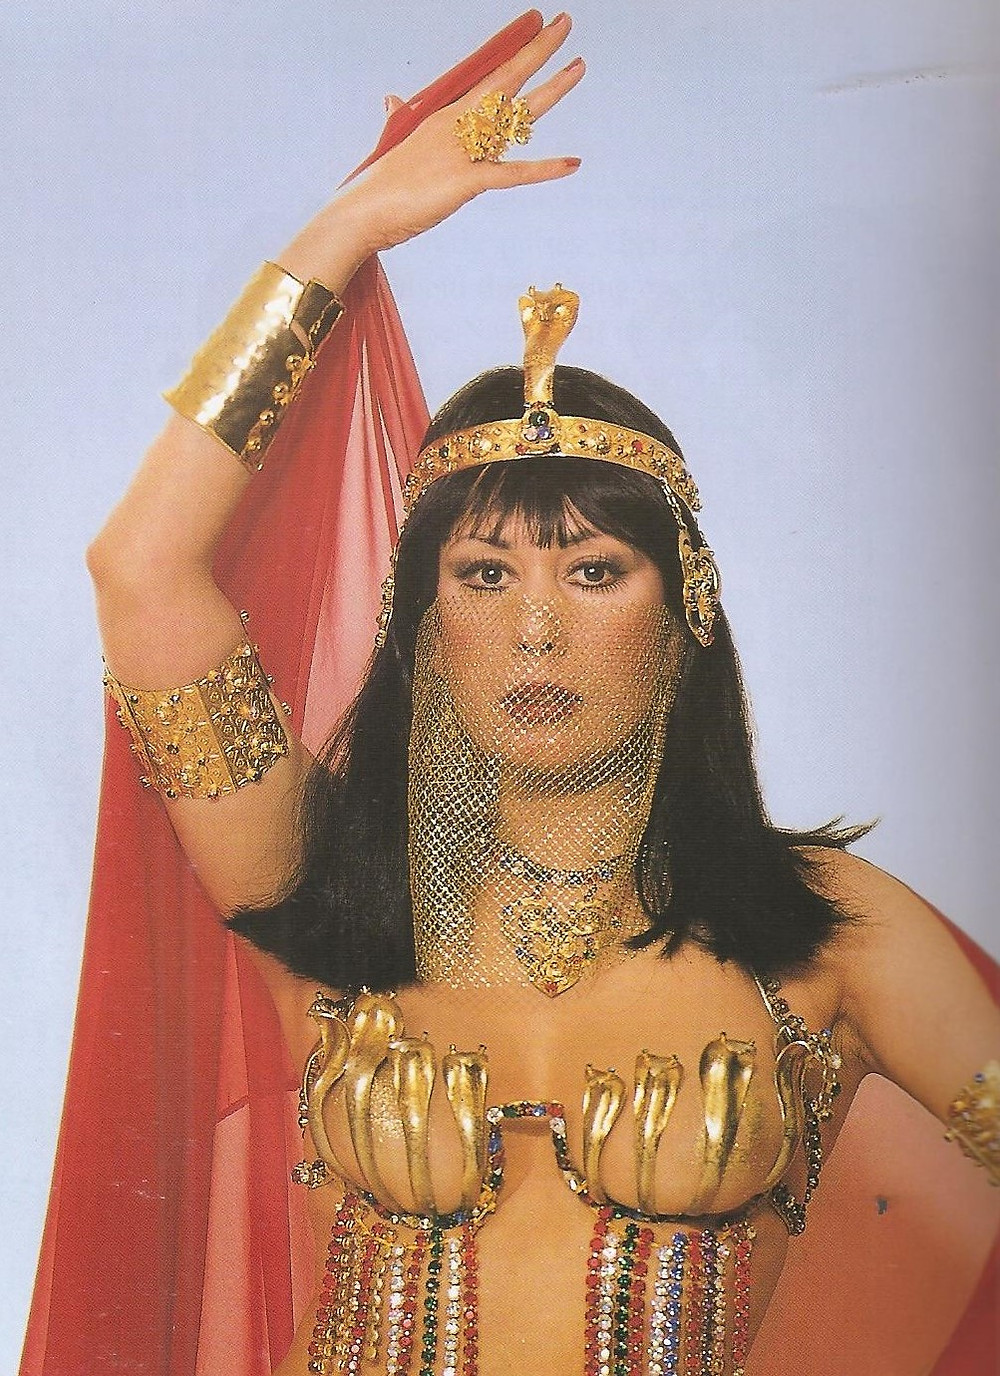 Princess Banu of Turkey